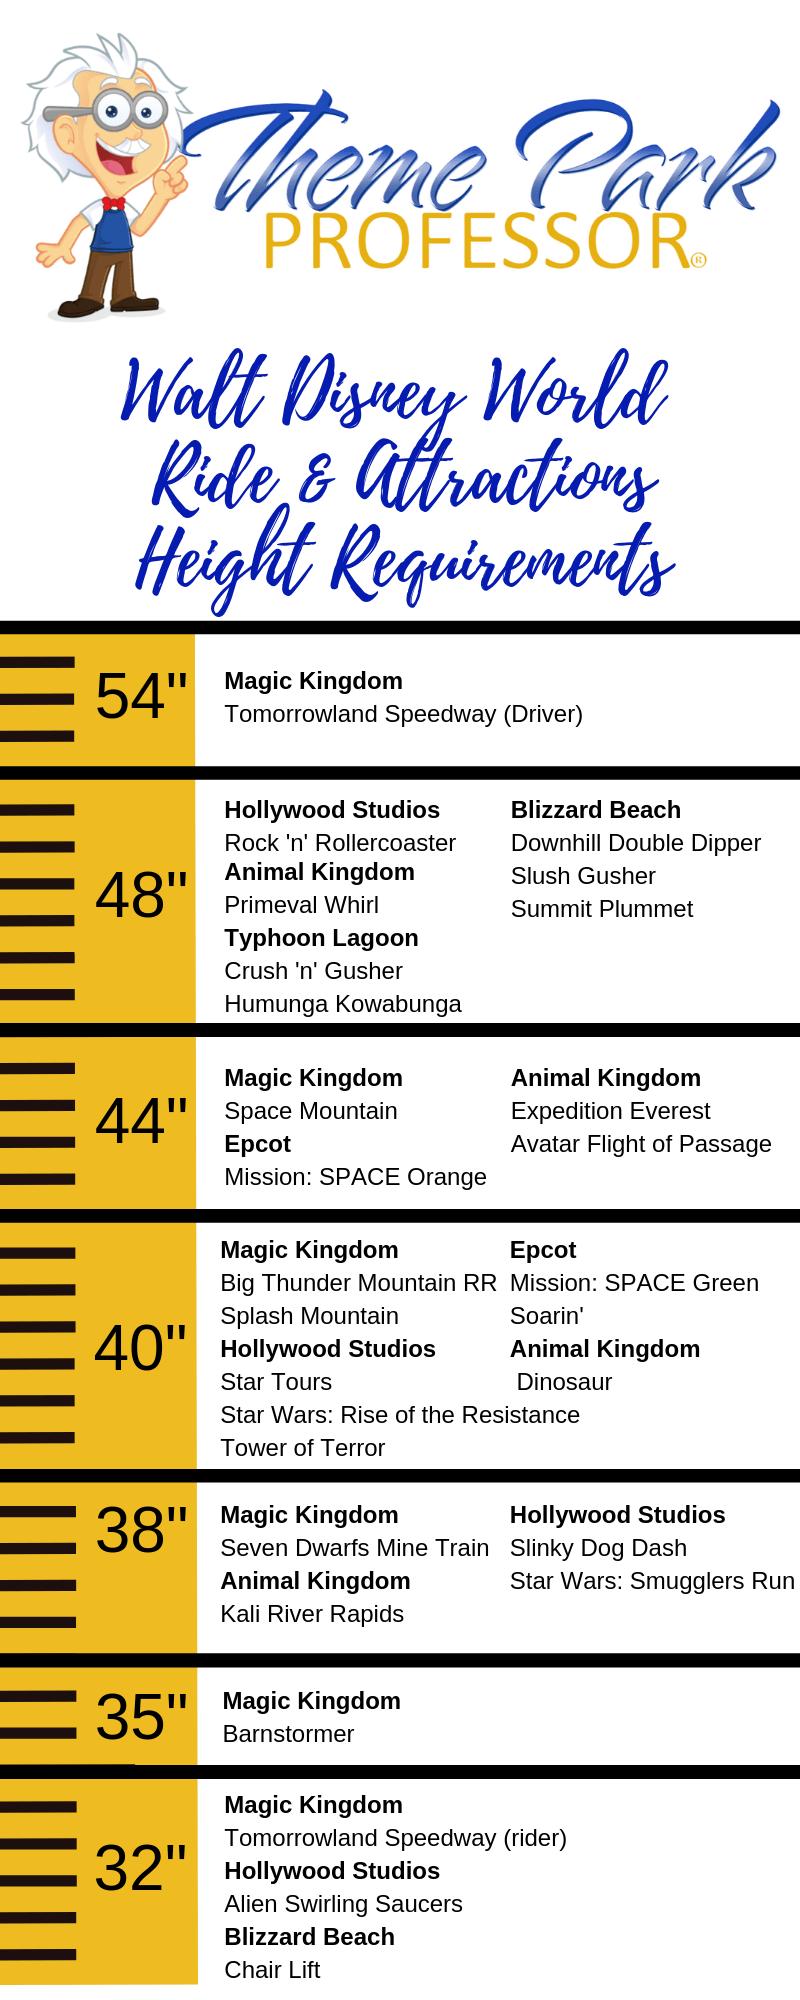 Walt Disney World Attractions Height Requirements